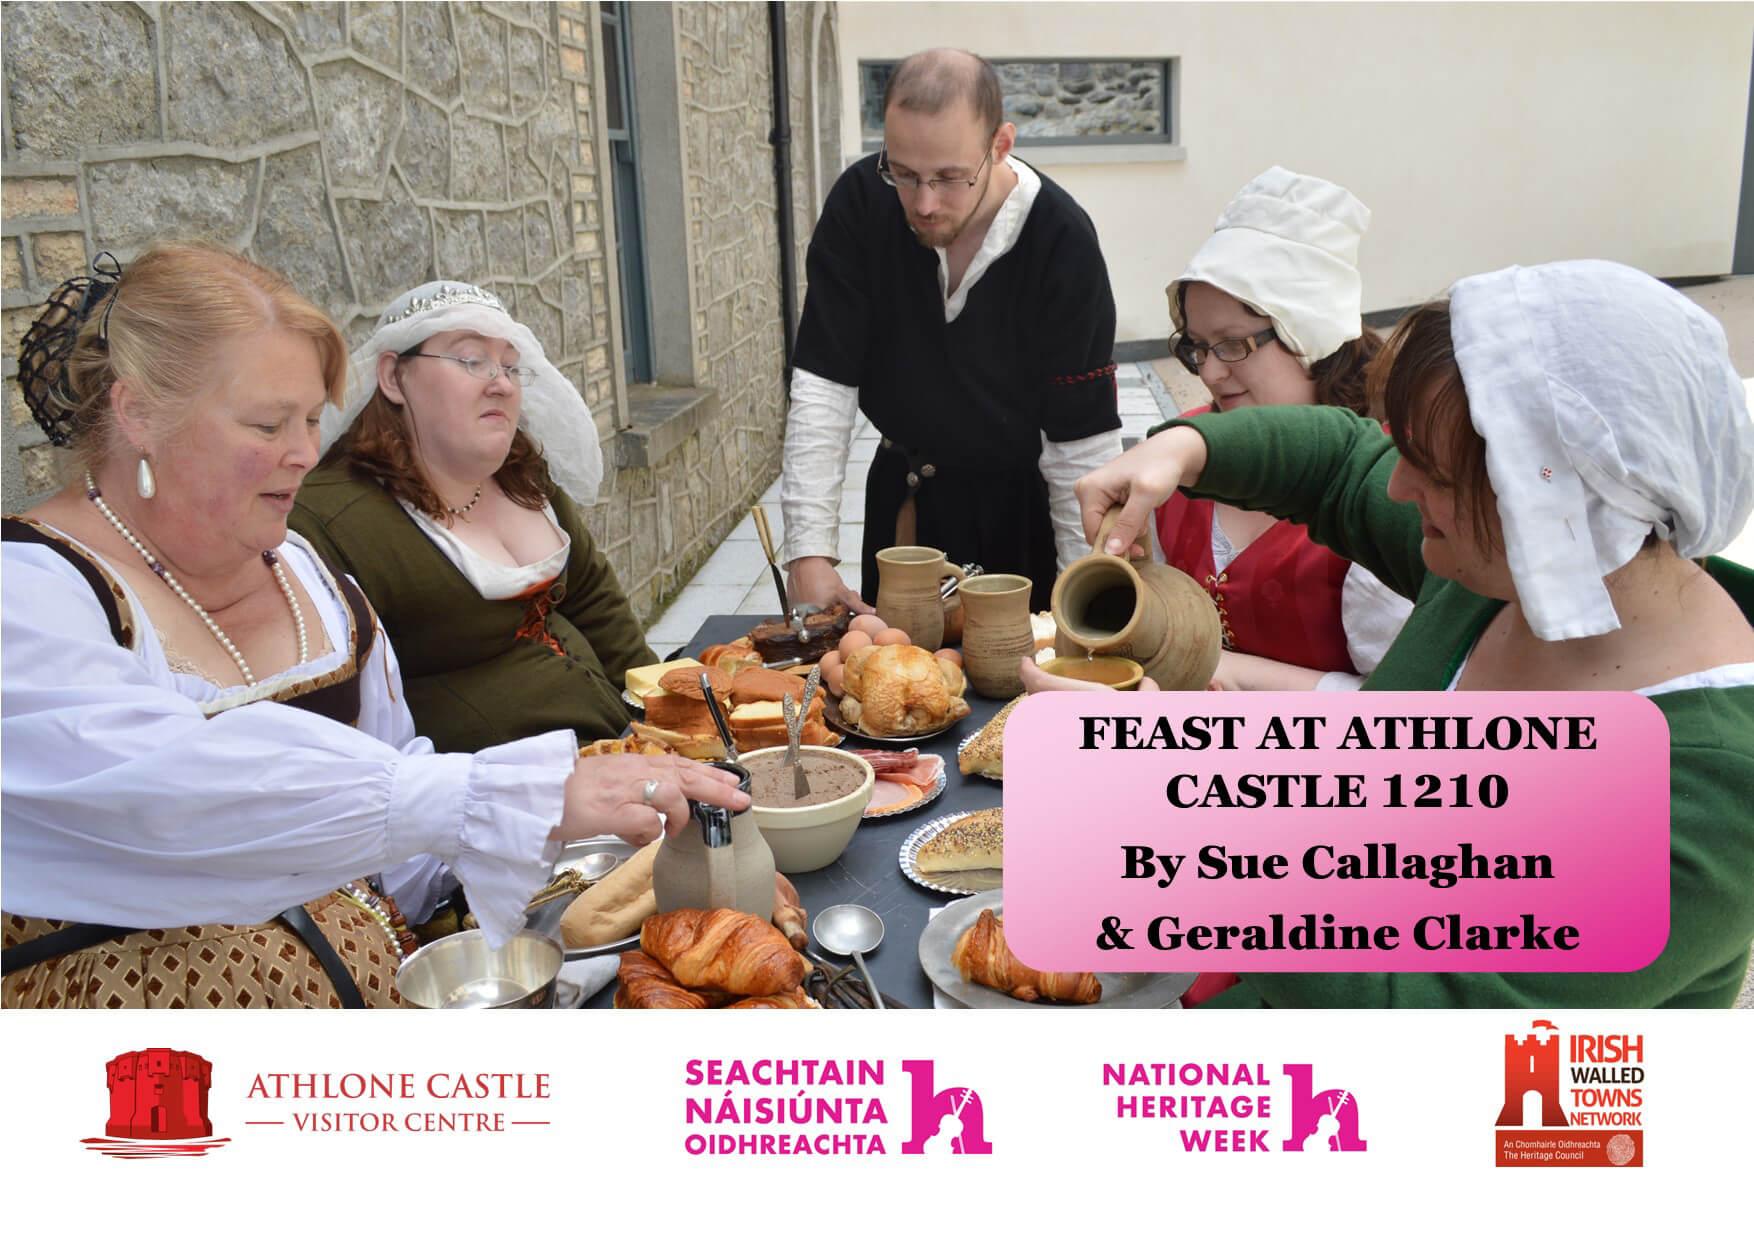 Athlone Castle